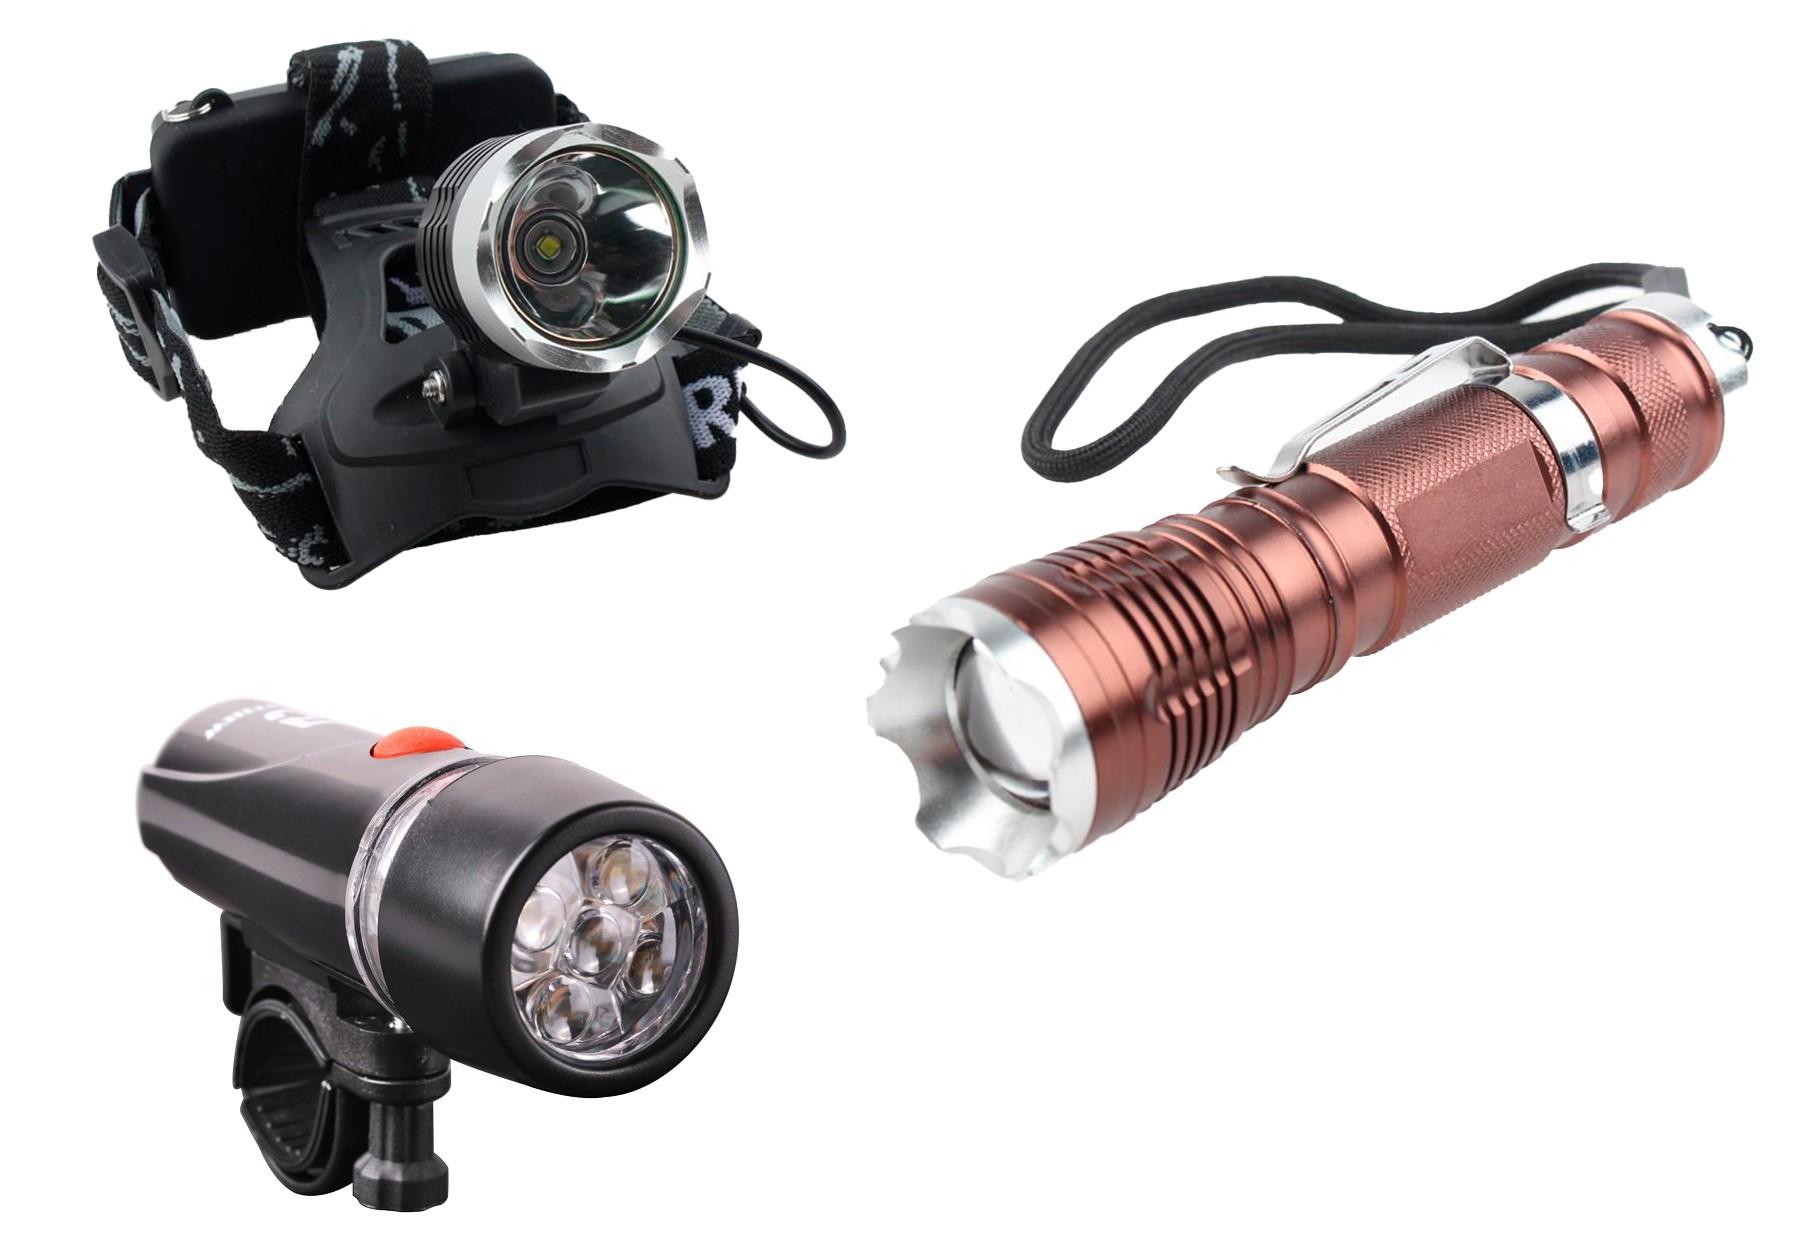 LED Flashlights for Bikes & Bicycles, Hand Flashlights & More Est. Original Retail €5,097, Tanna, DE